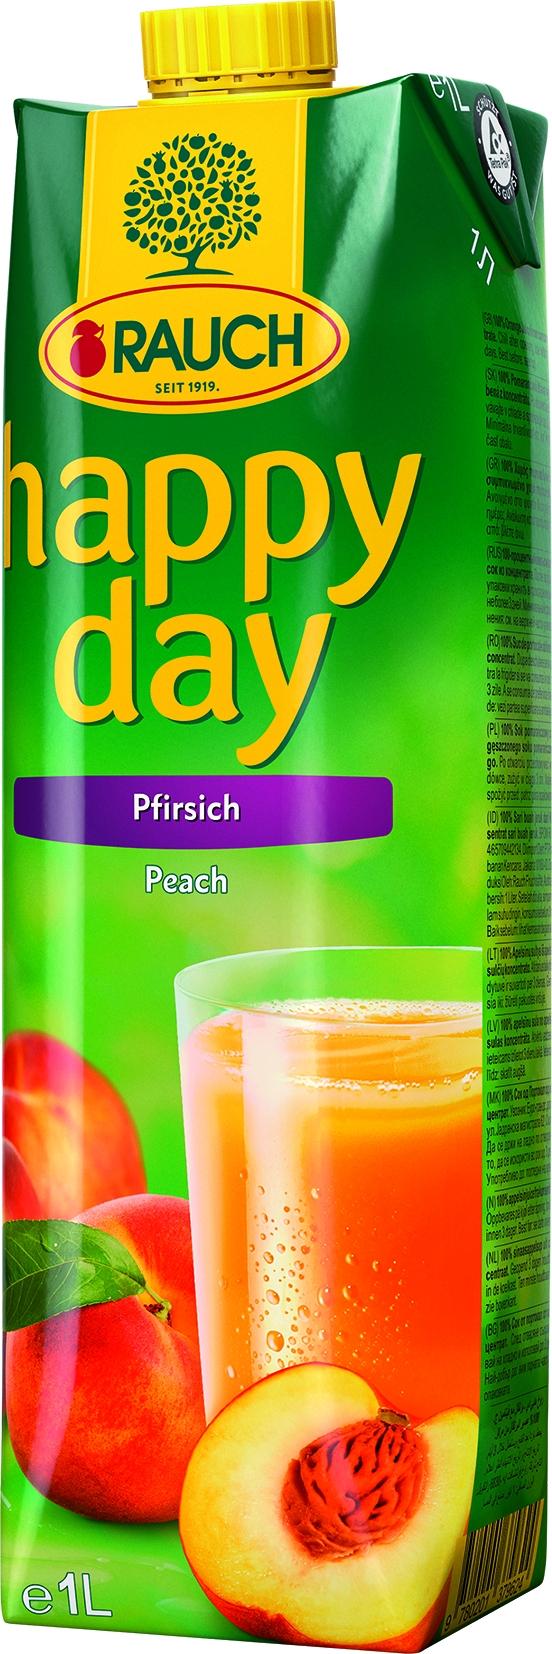 Happy Day Pfirsich